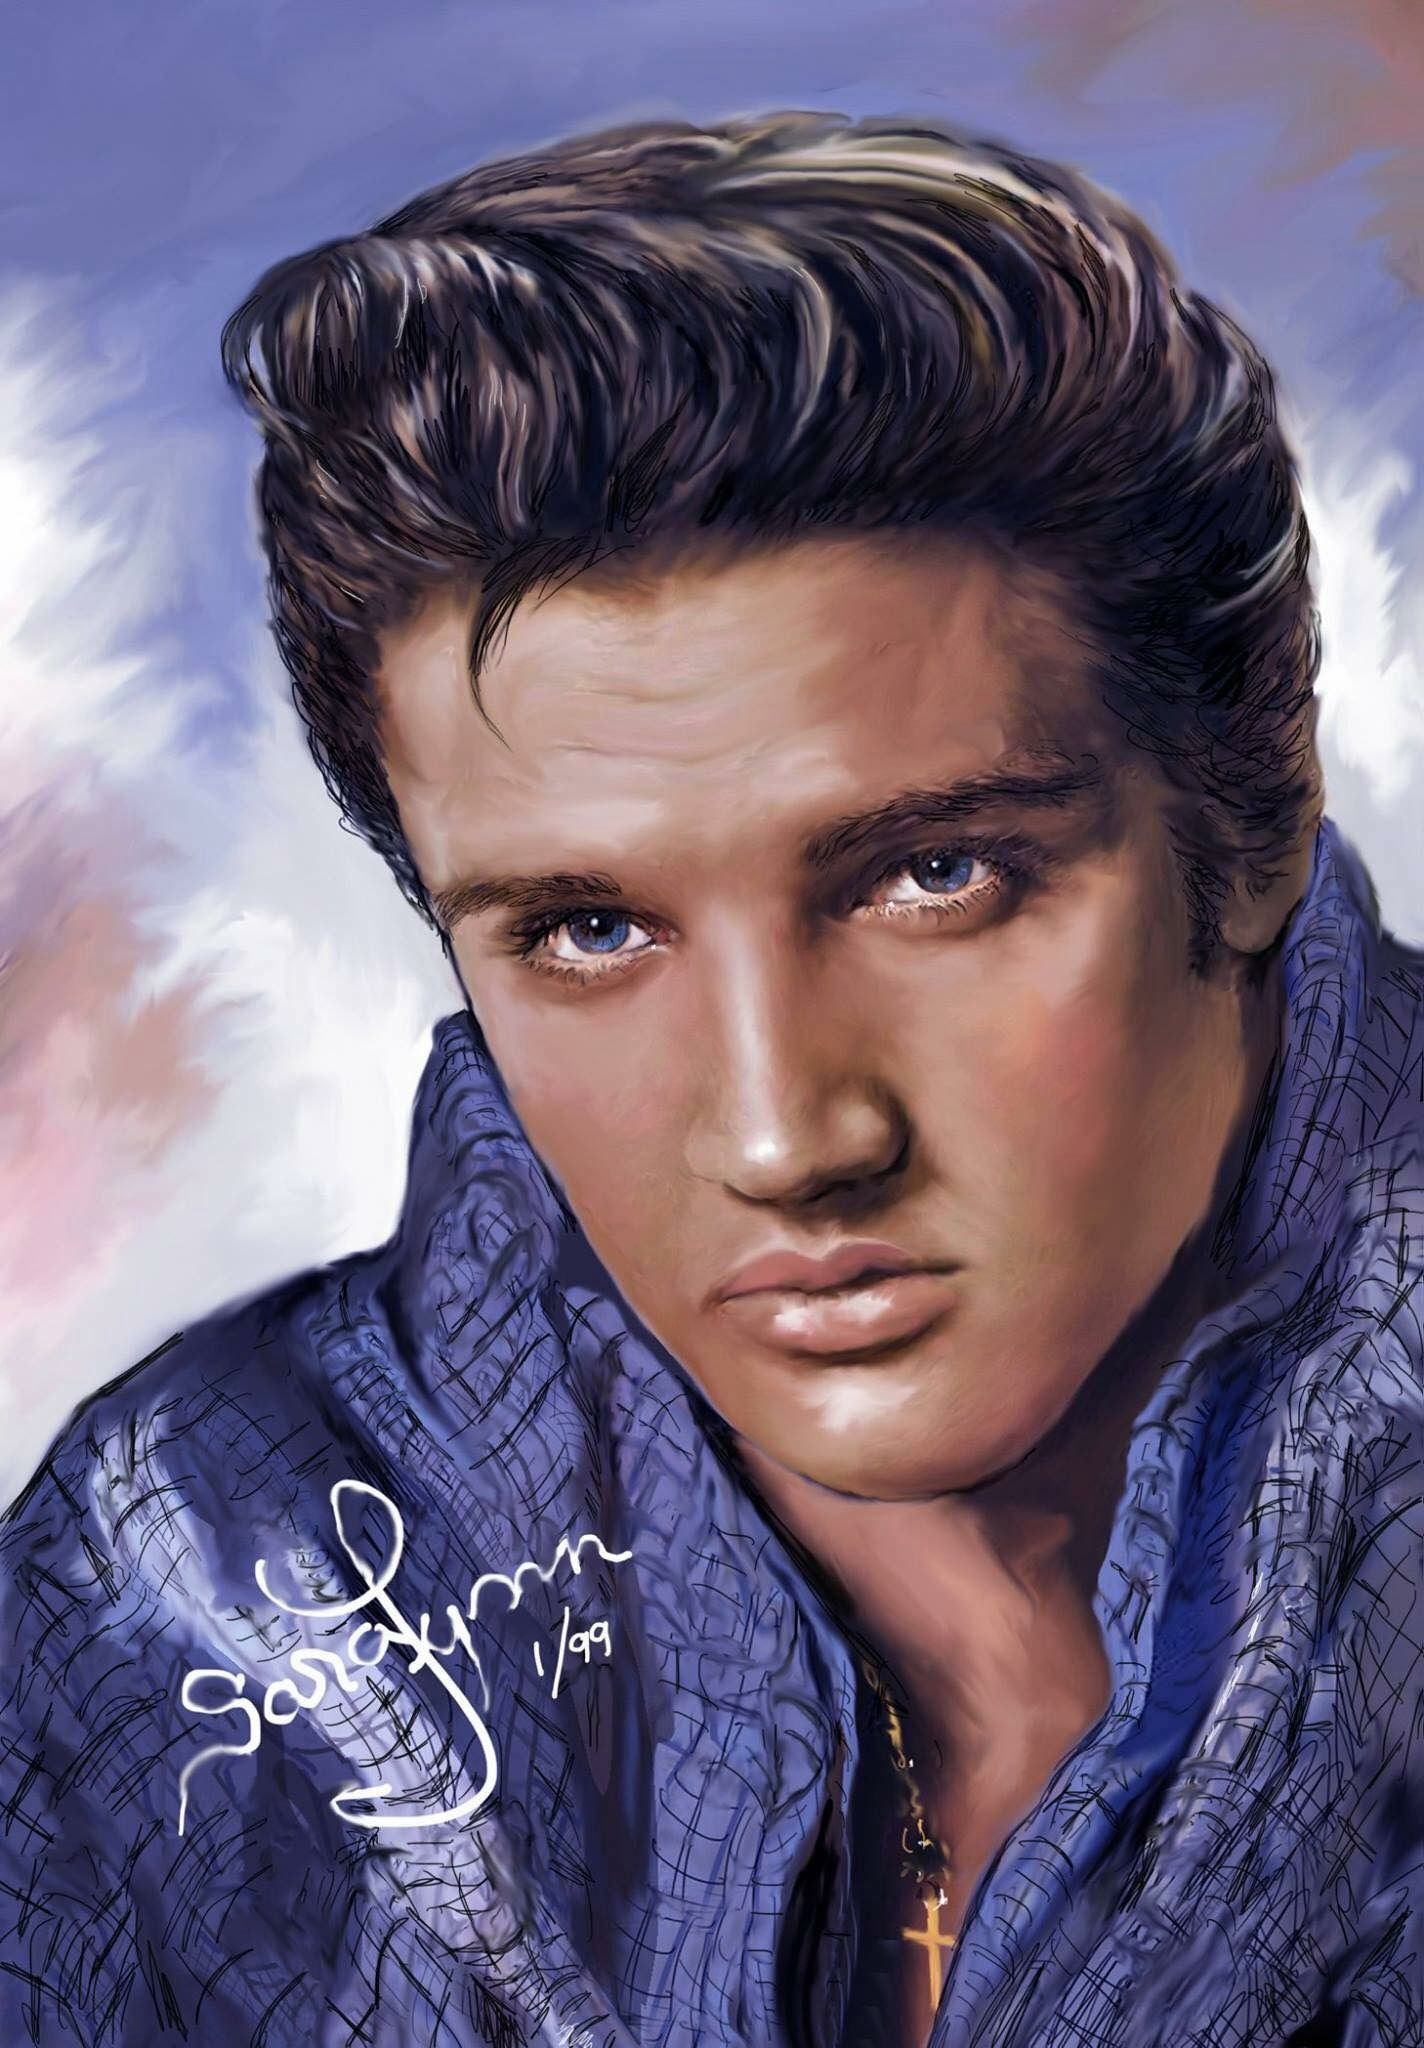 Elvis Presley painting by Andy Warhol sells for $82 ...  |1977 Elvis Painting